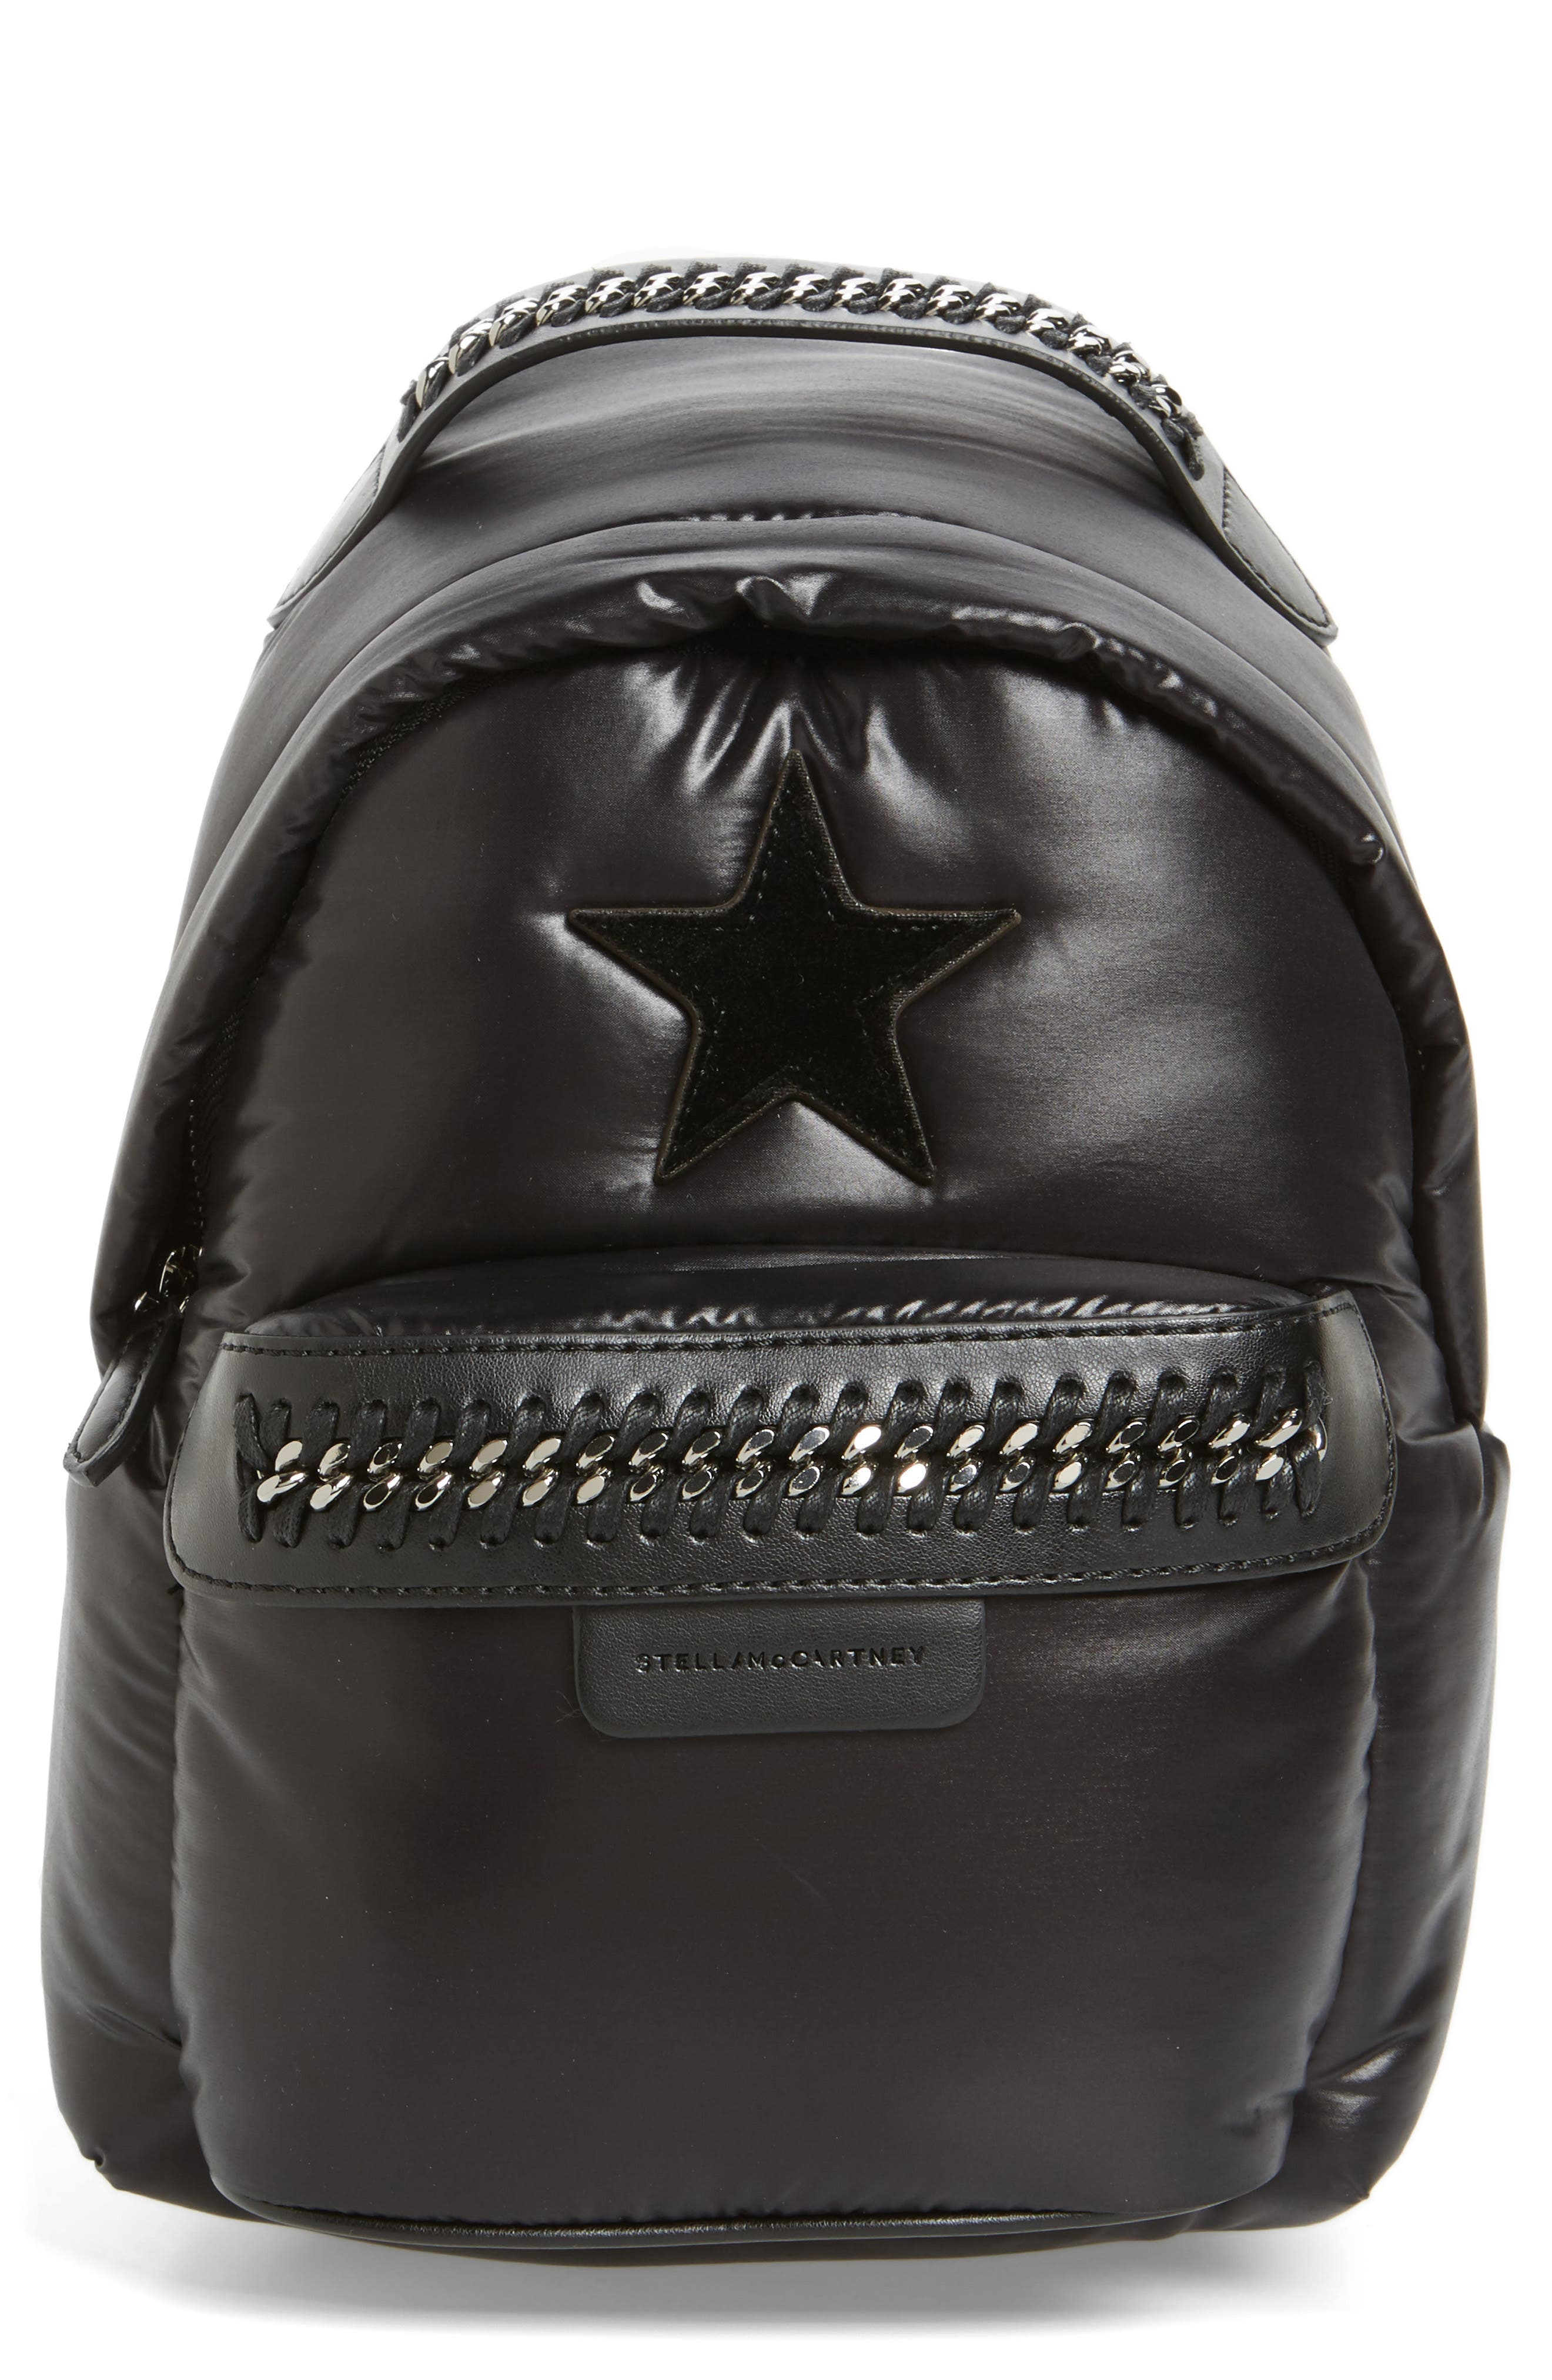 Alternate Image 1 Selected - Stella McCartney Mini Falabella Go Star Backpack